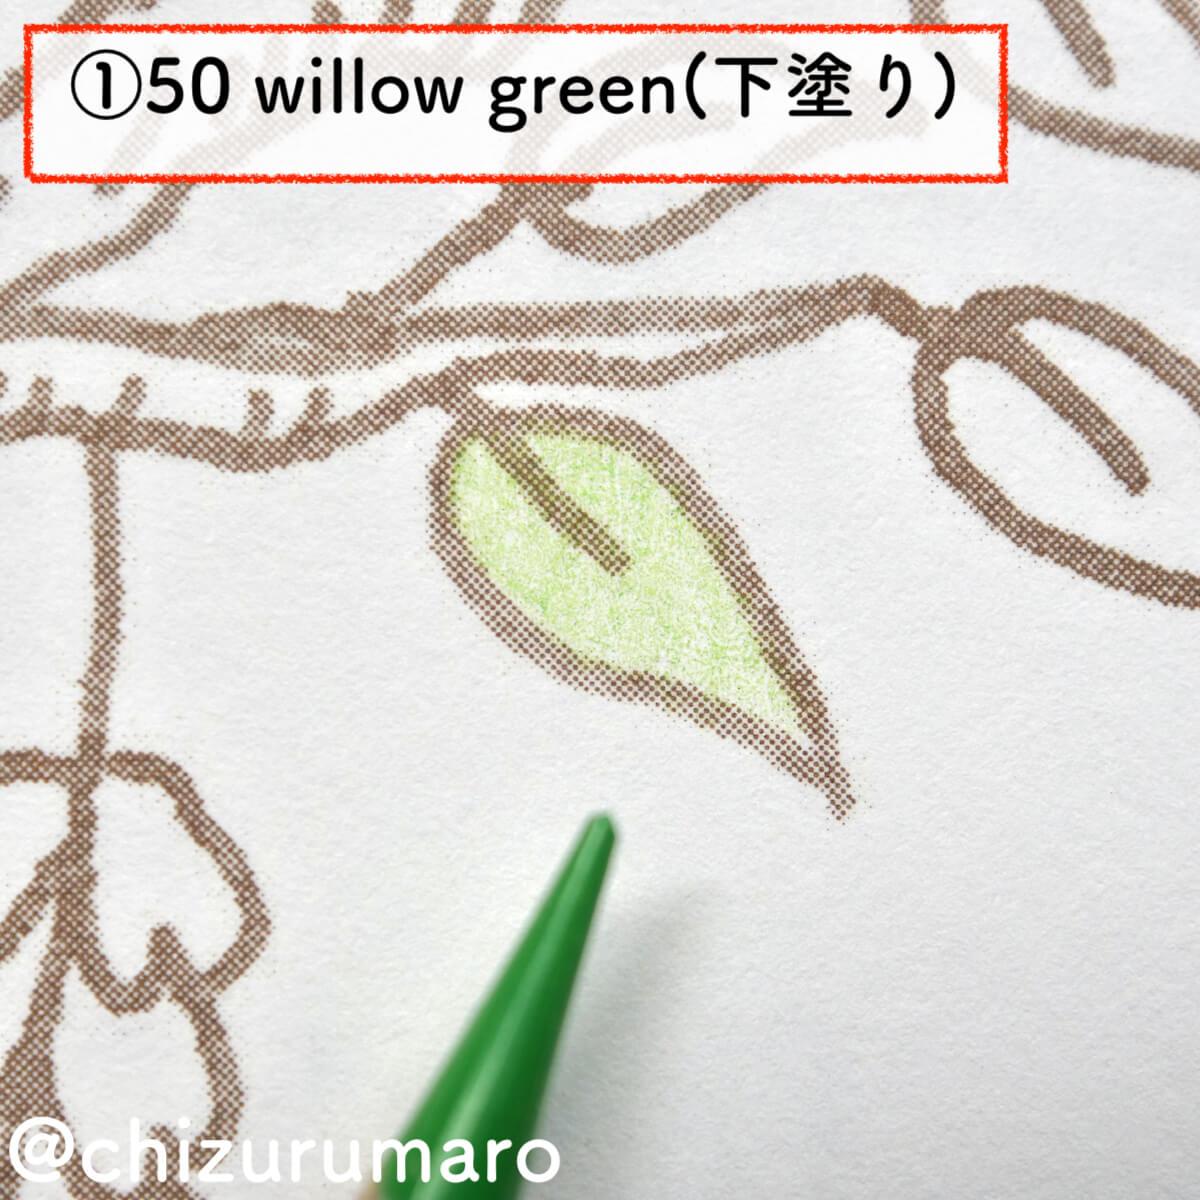 f:id:chizurumaro:20201105212022j:plain